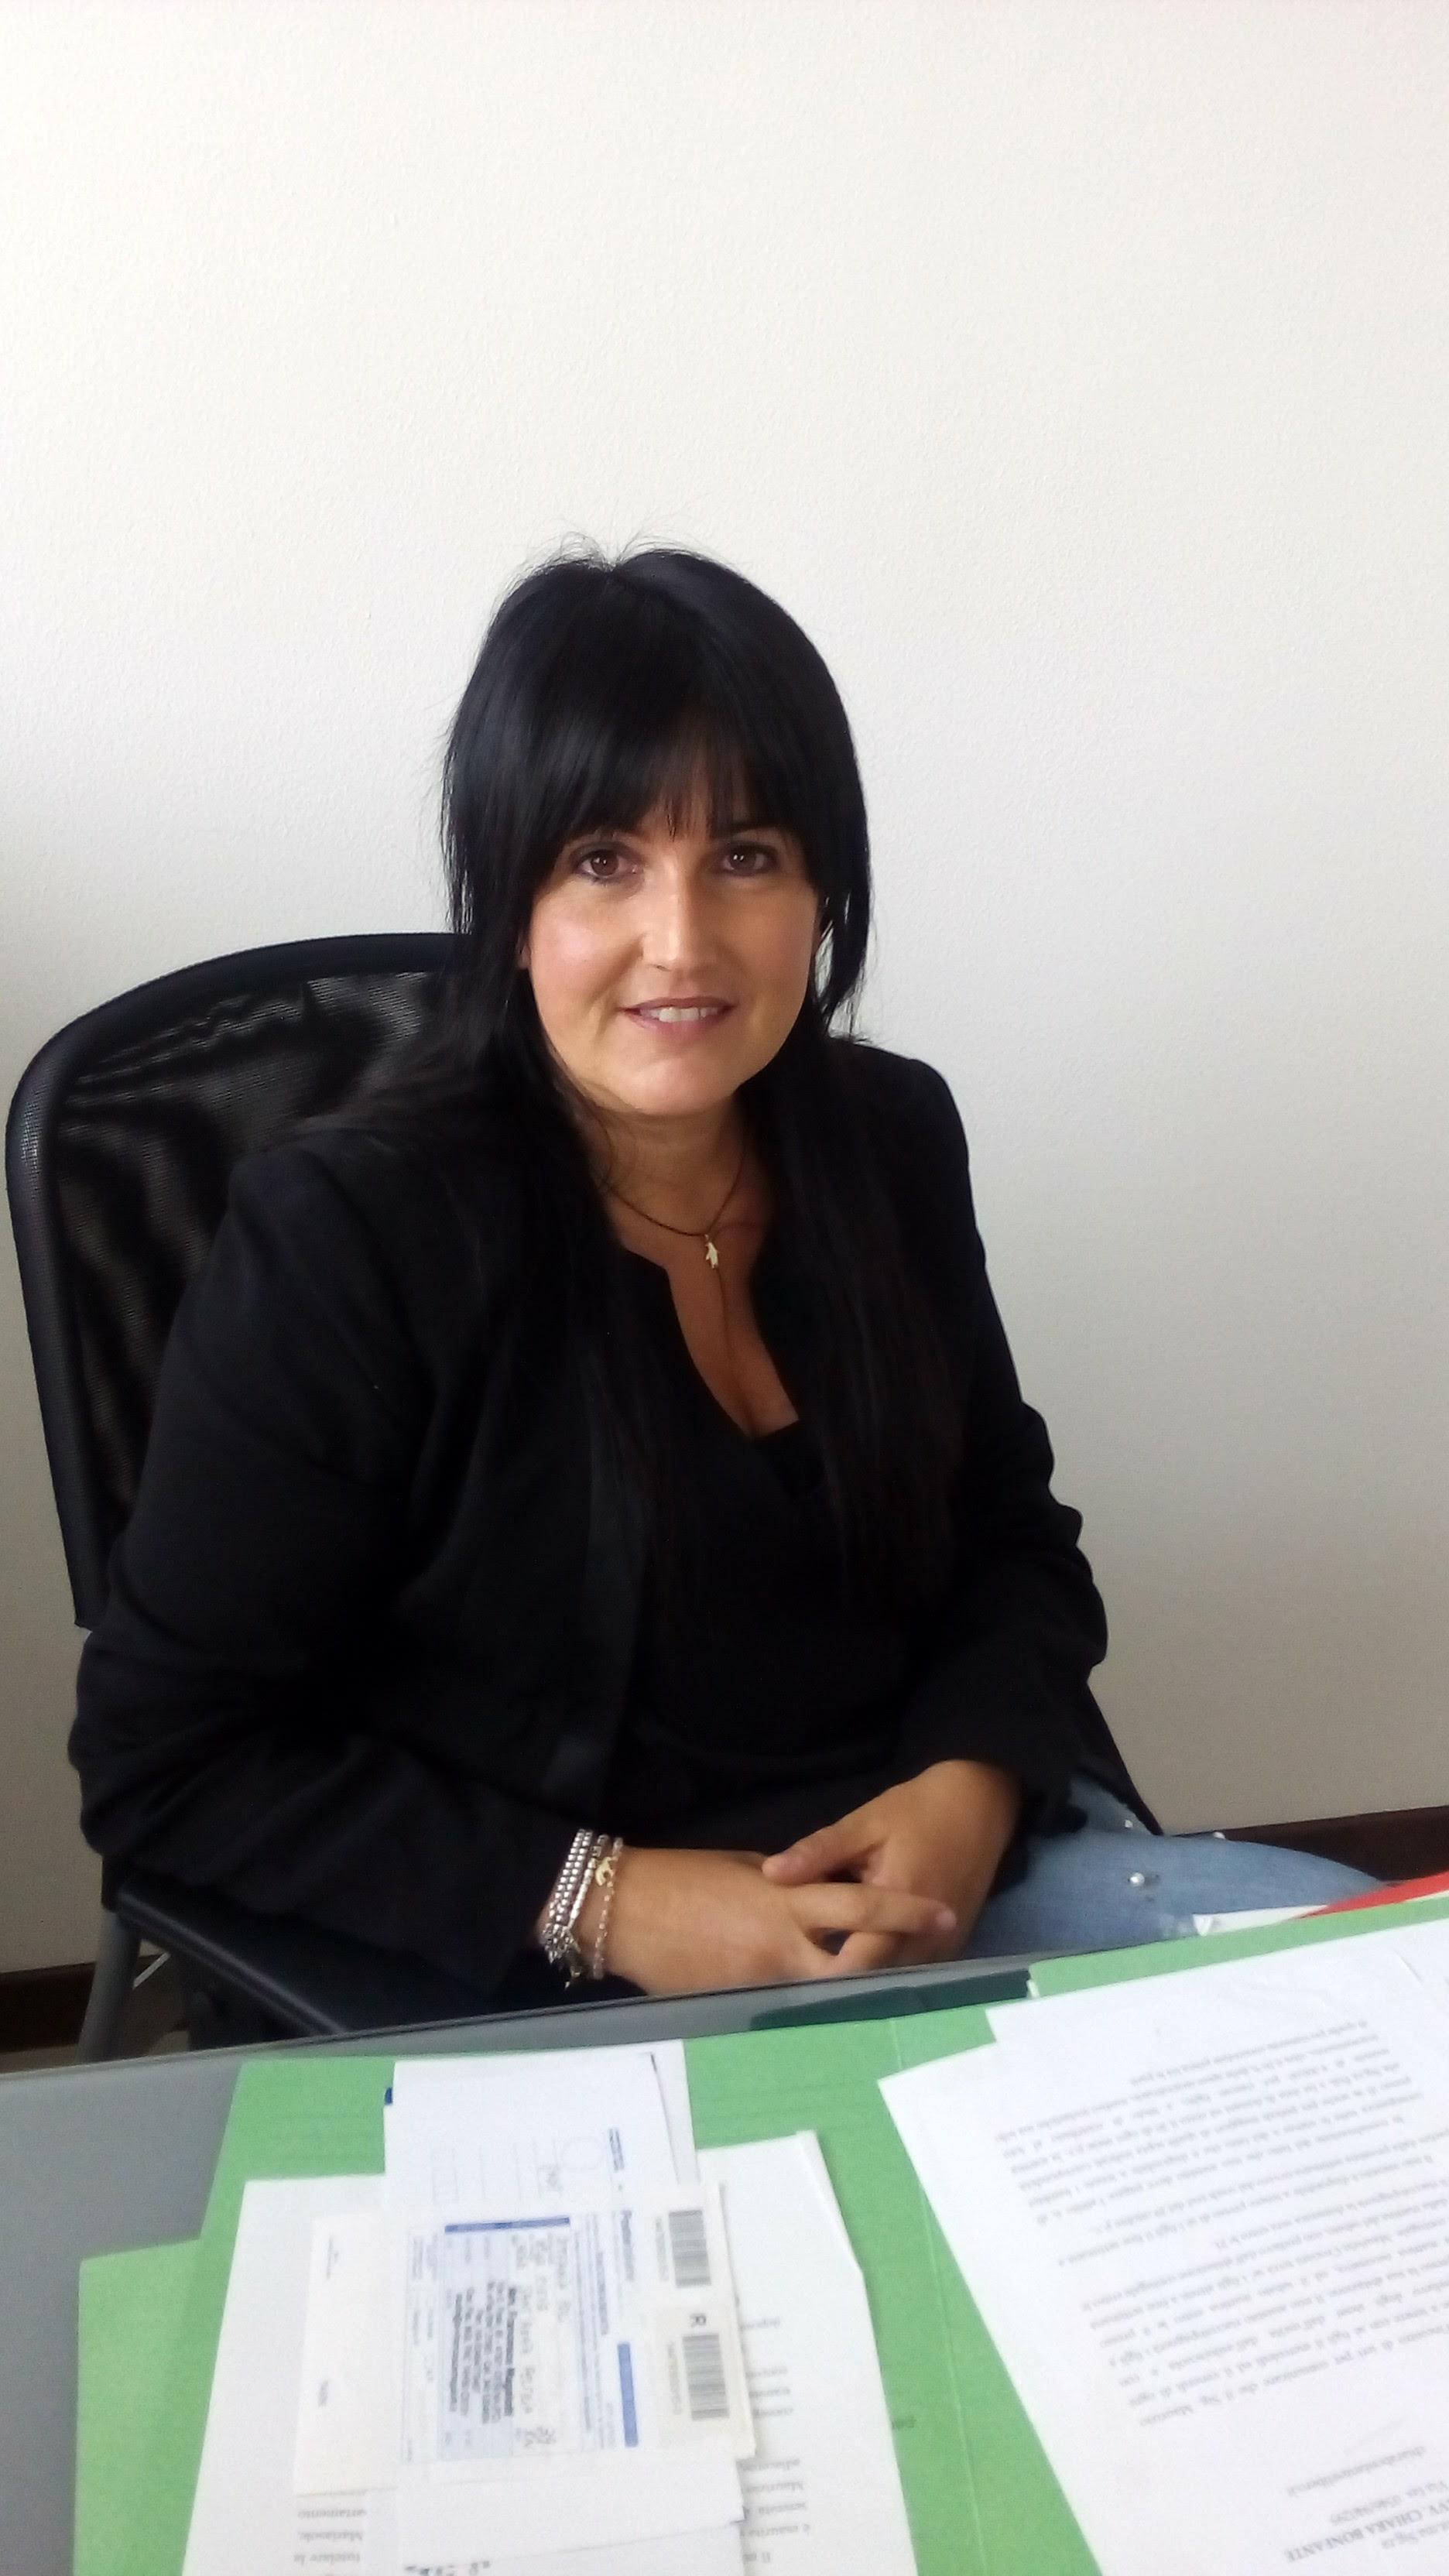 Avvocato Francesca Magalotti